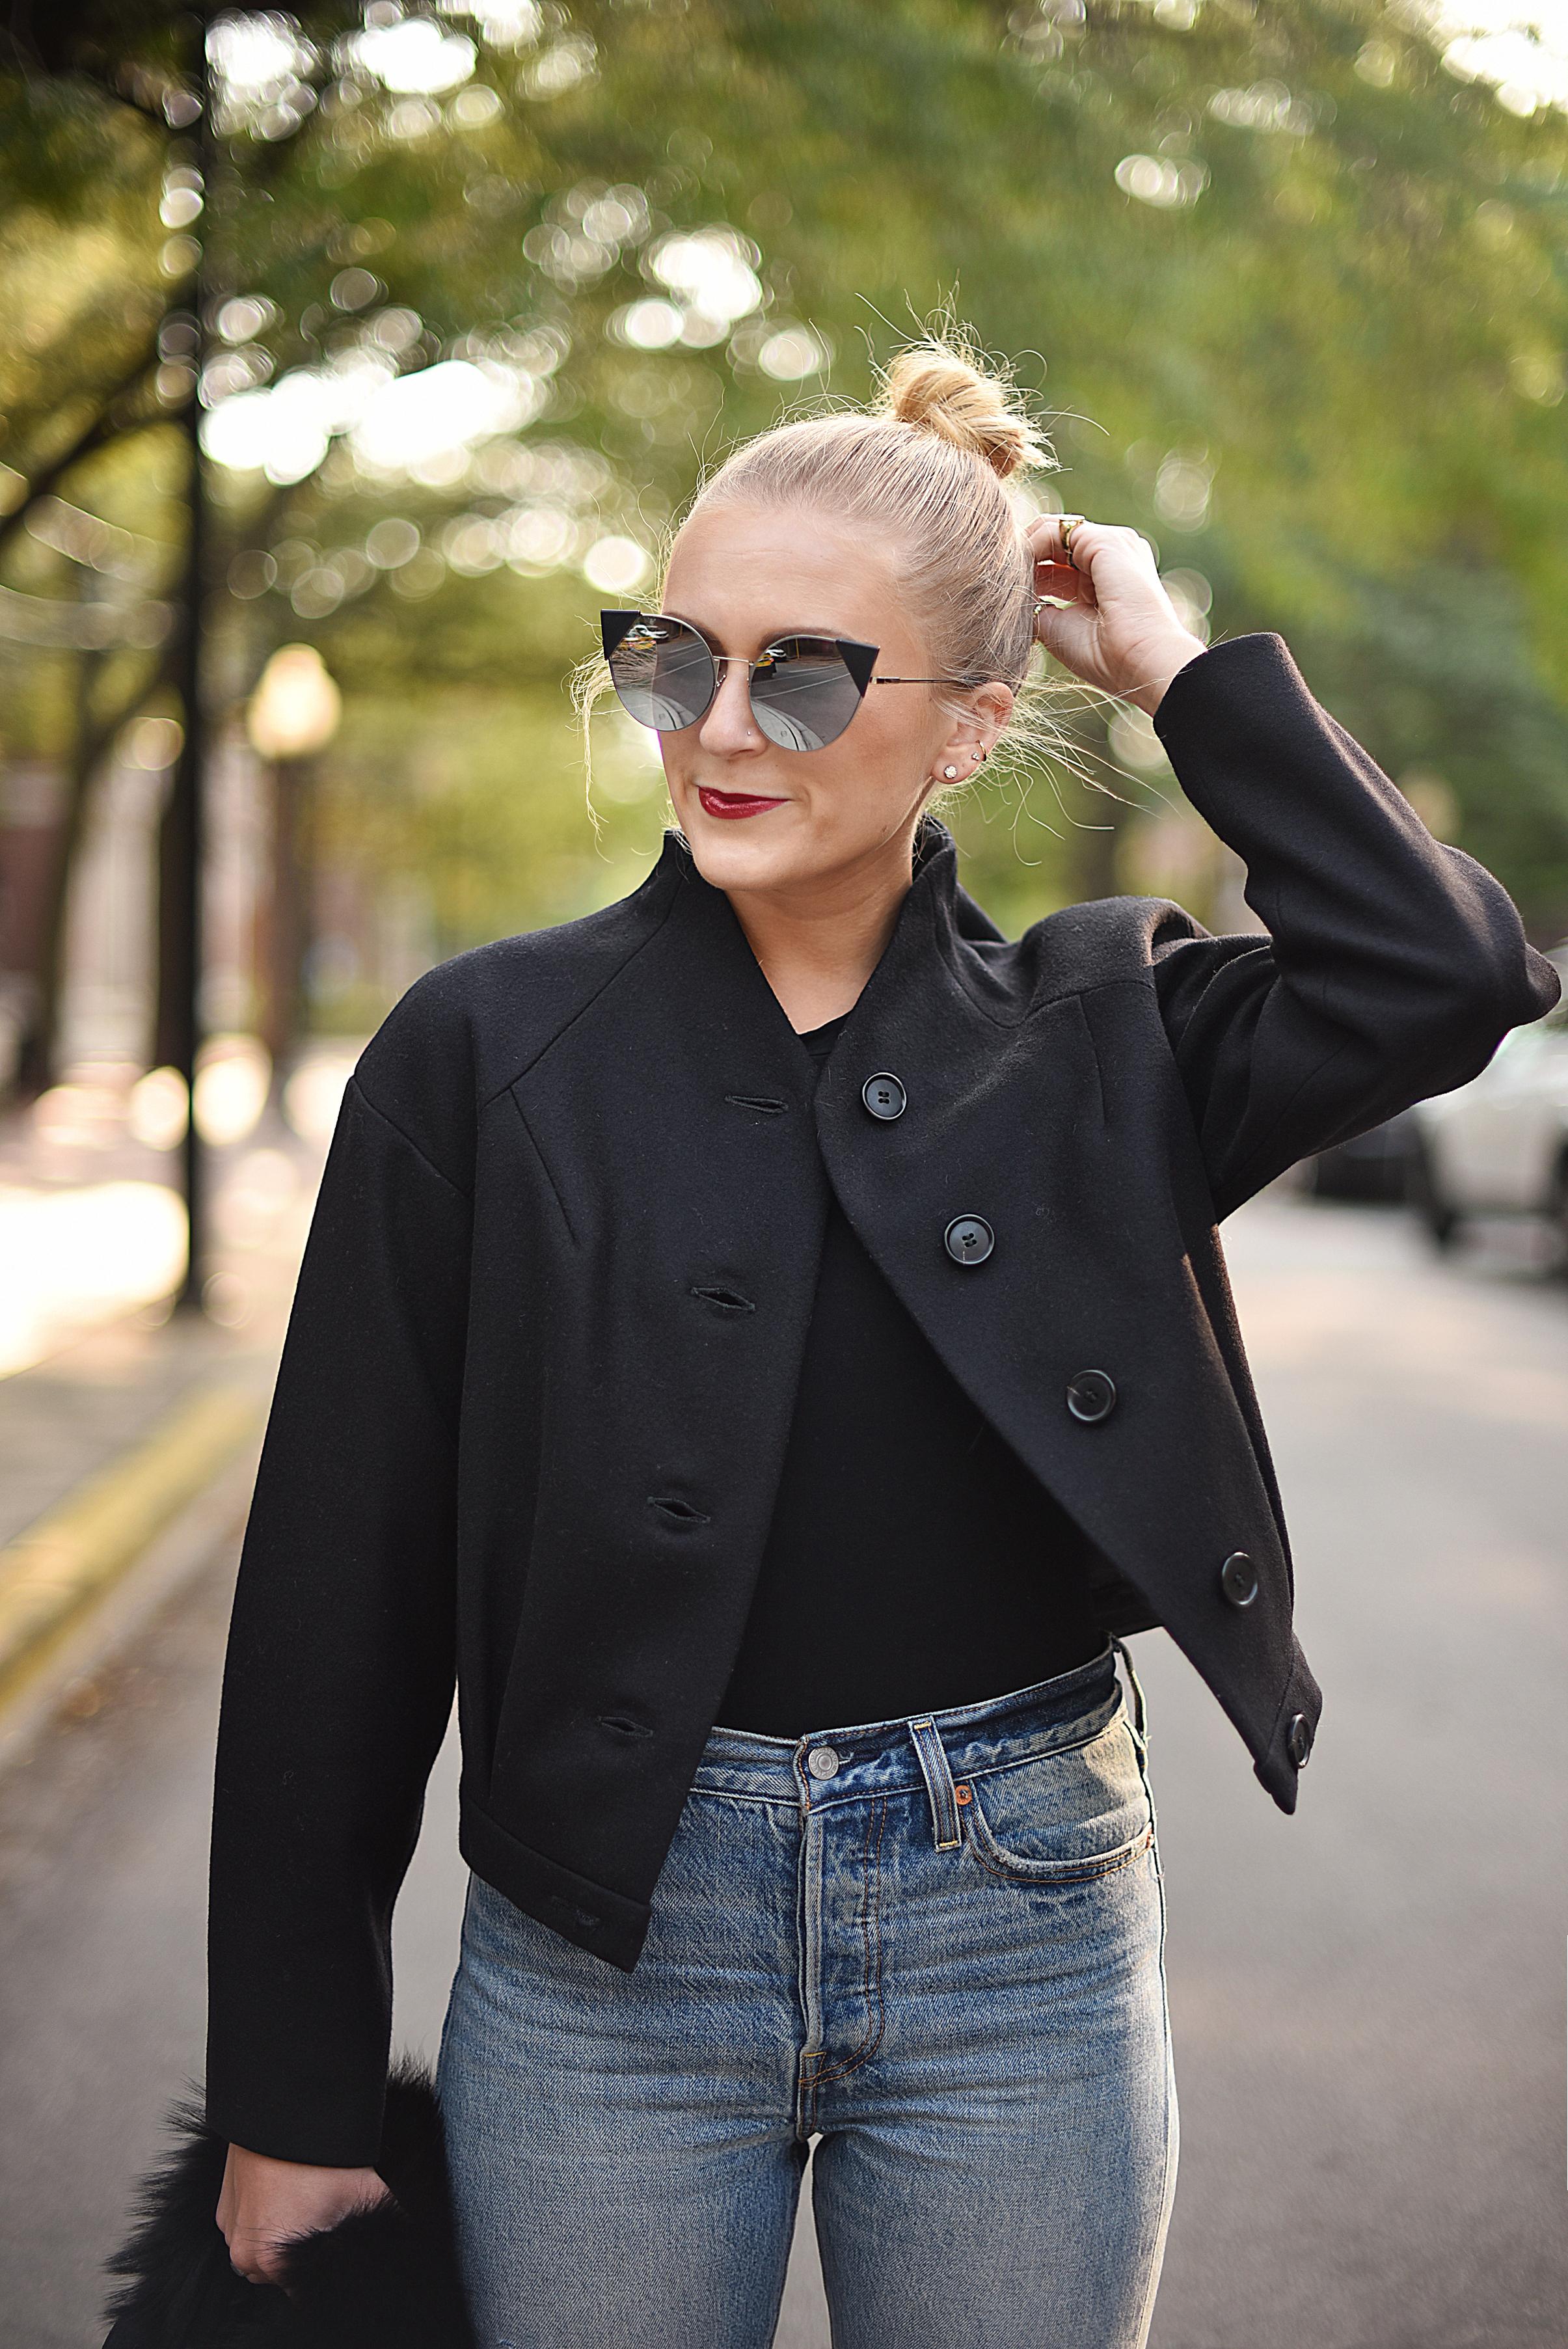 wool bomber jacket fall season